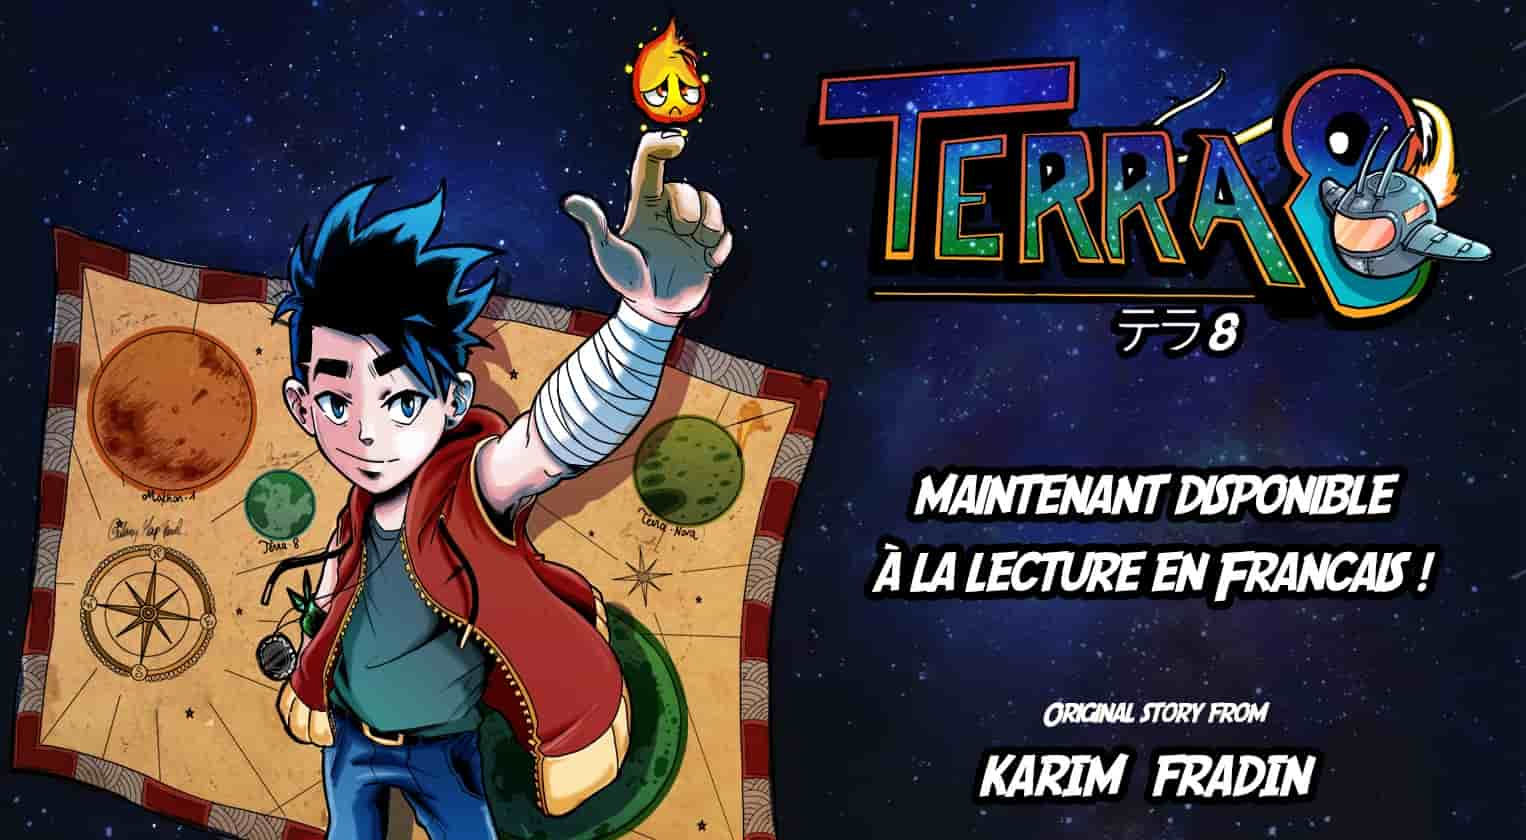 Terra 8 - scan gratuit manga en ligne manga scan gratuit bayday